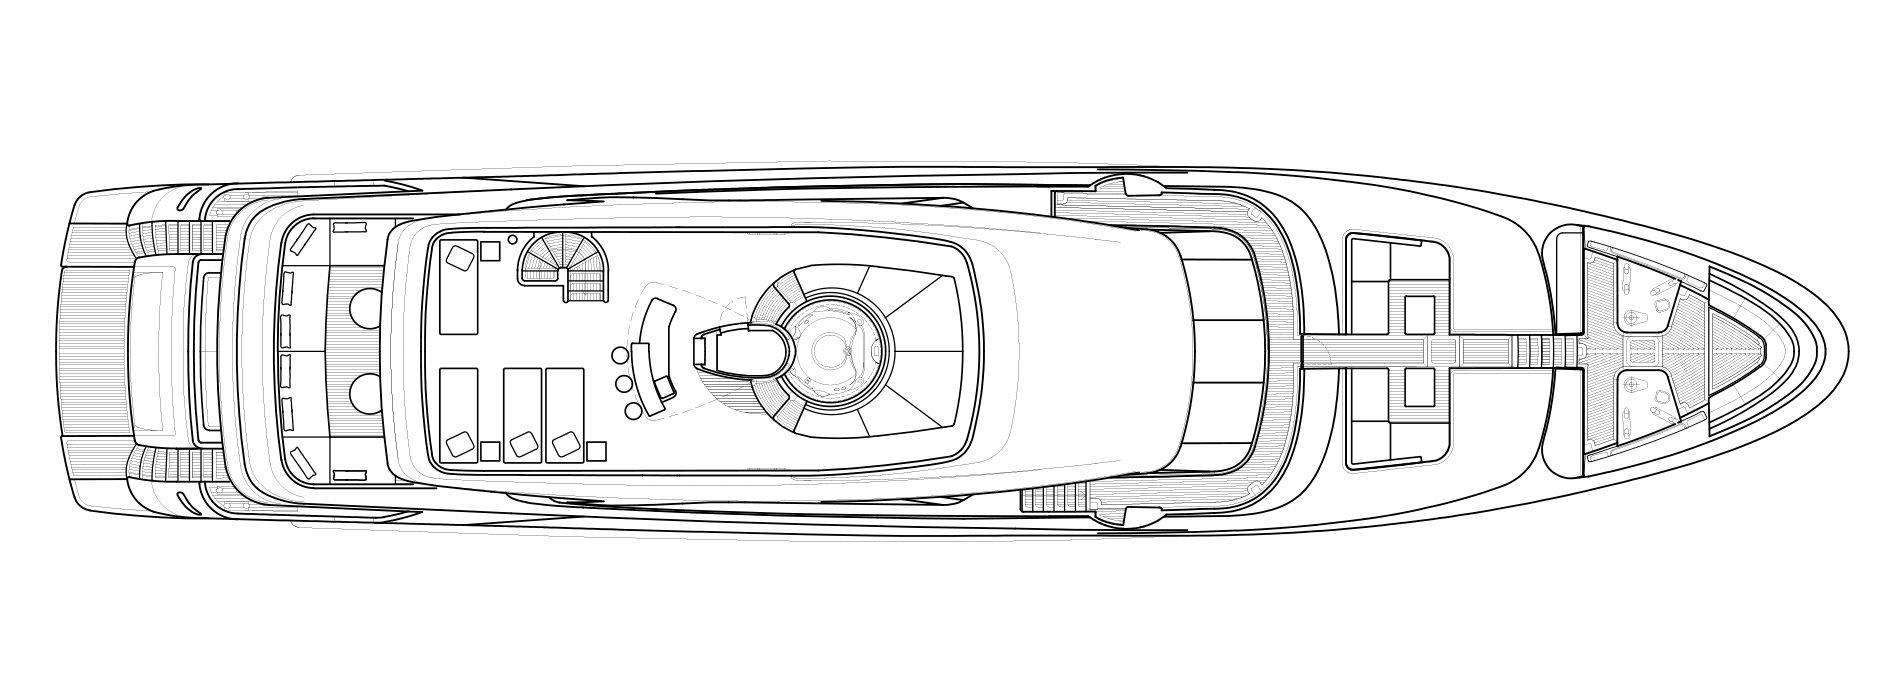 Sanlorenzo Yachts SD126 飞桥 Versione A